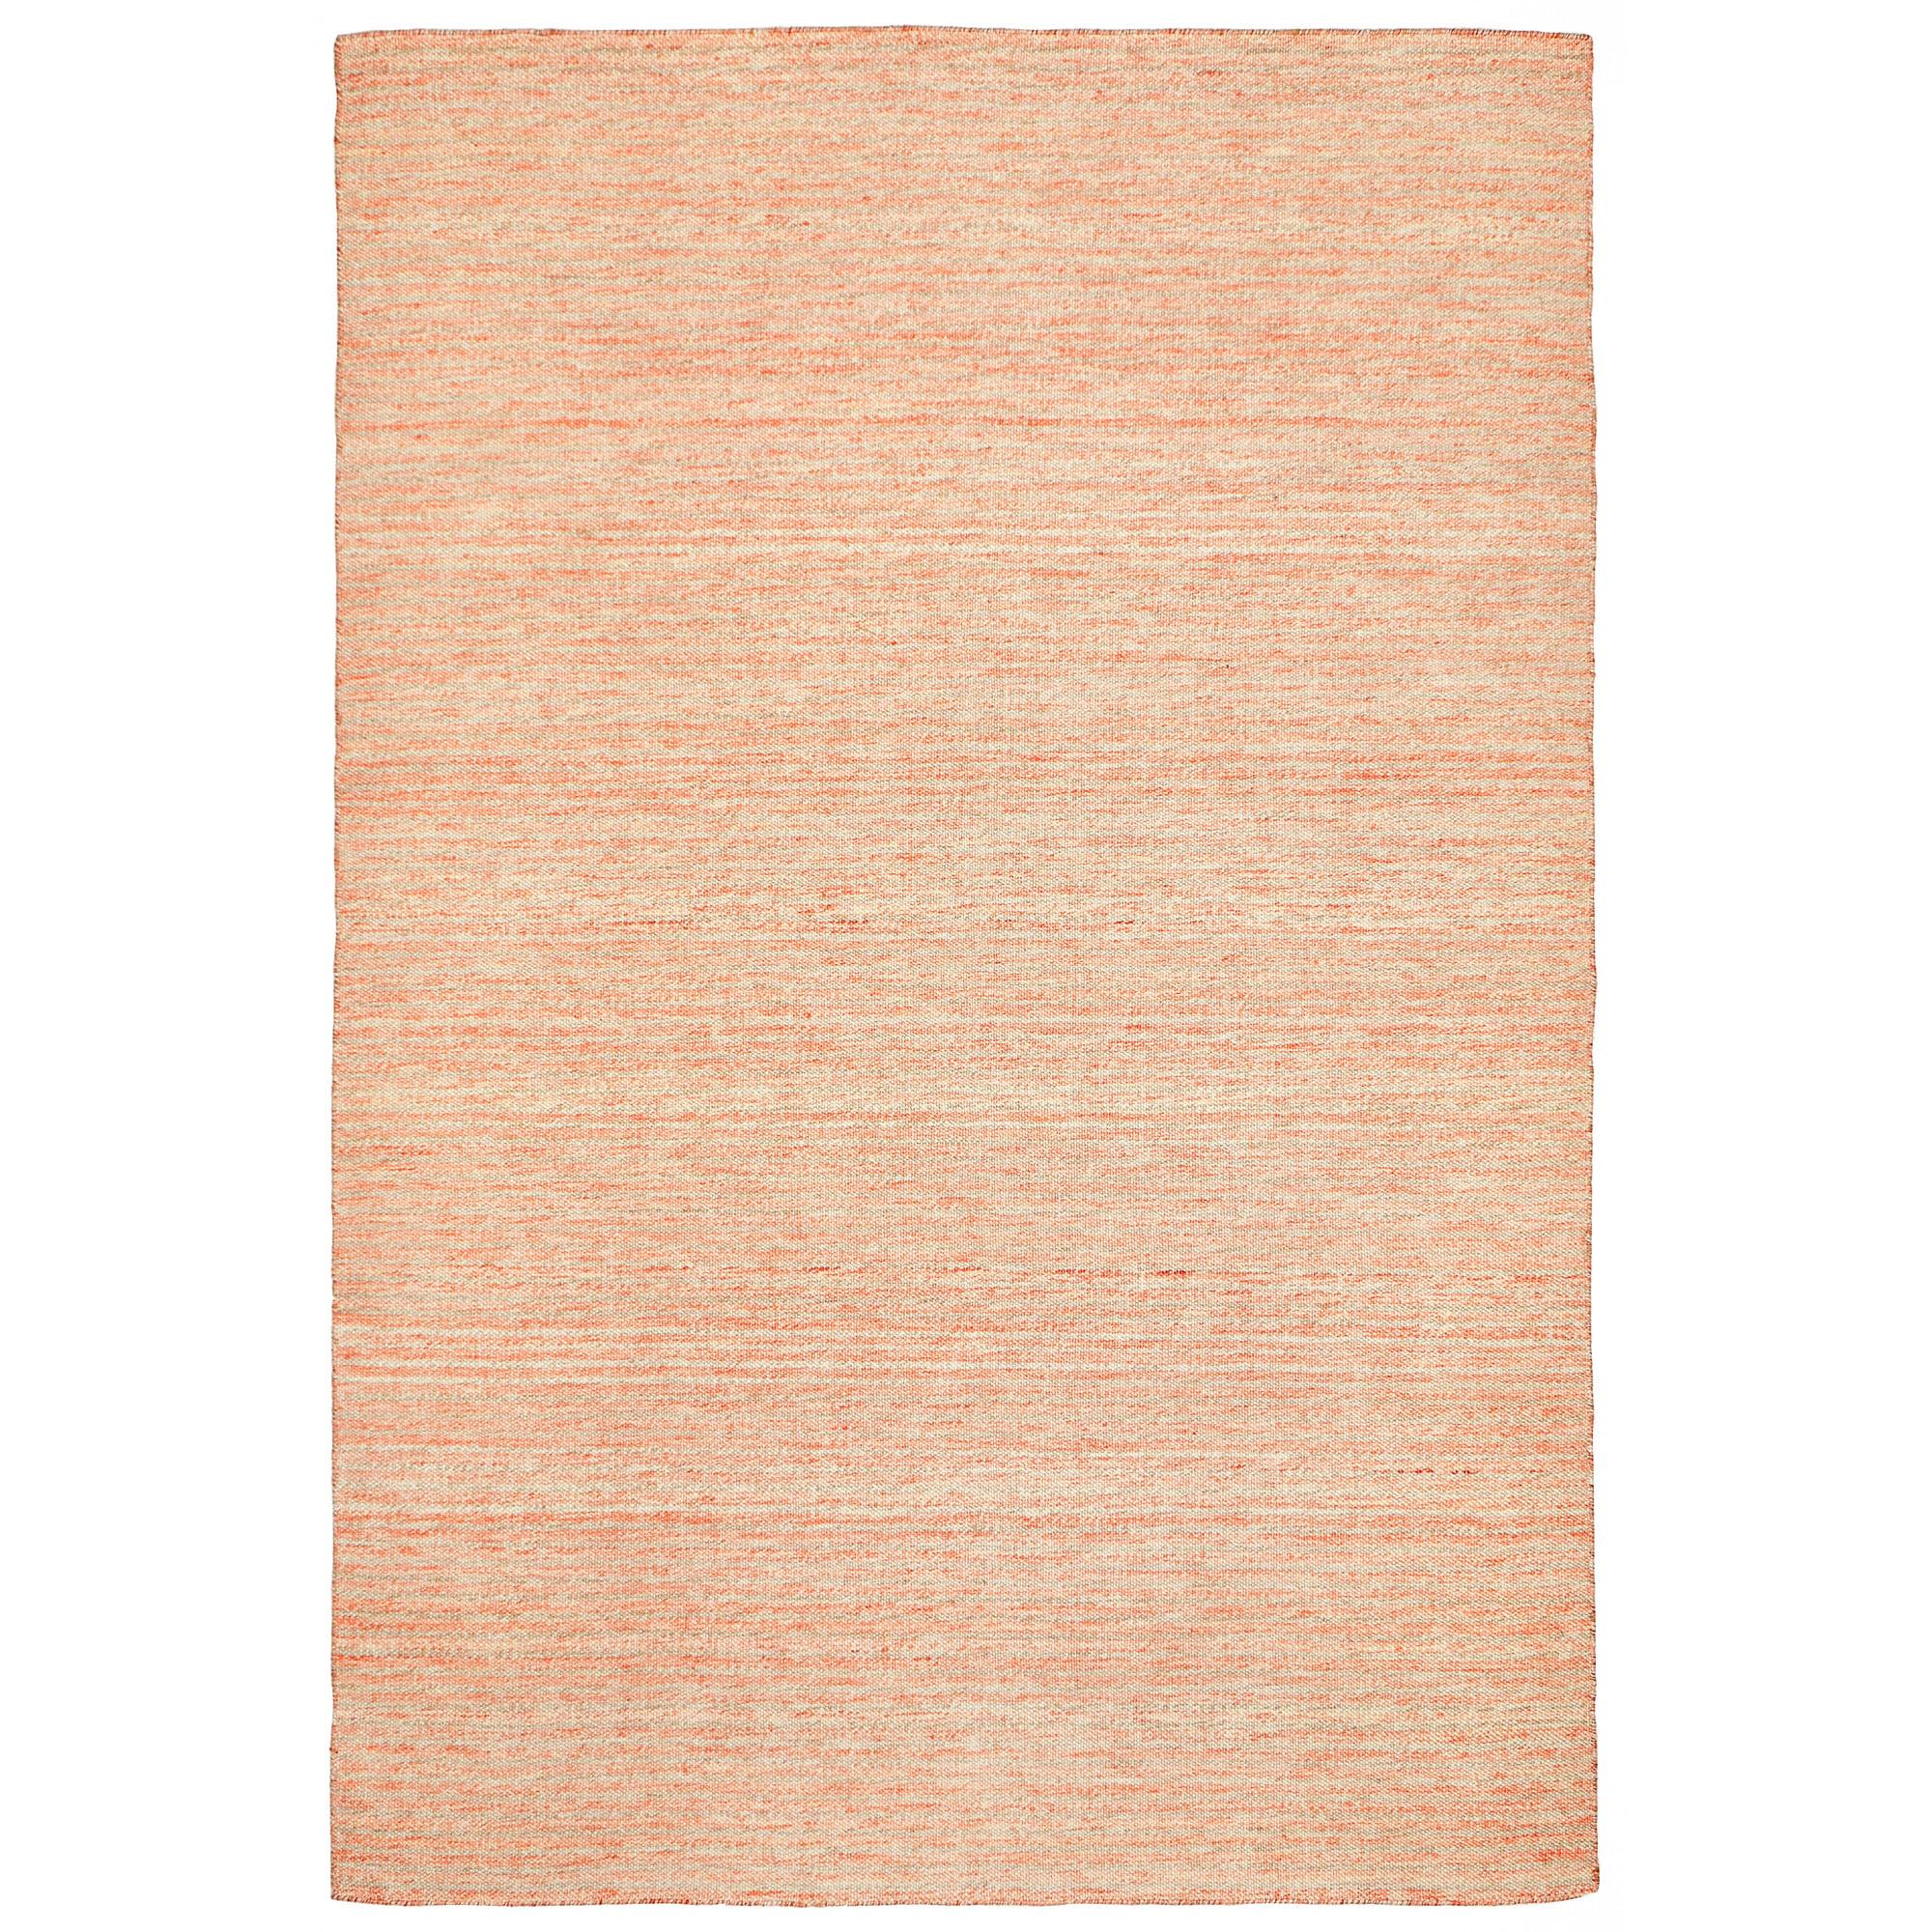 Liora Manne Mojave 6203/17 Pencil Stripe Orange Area Rug